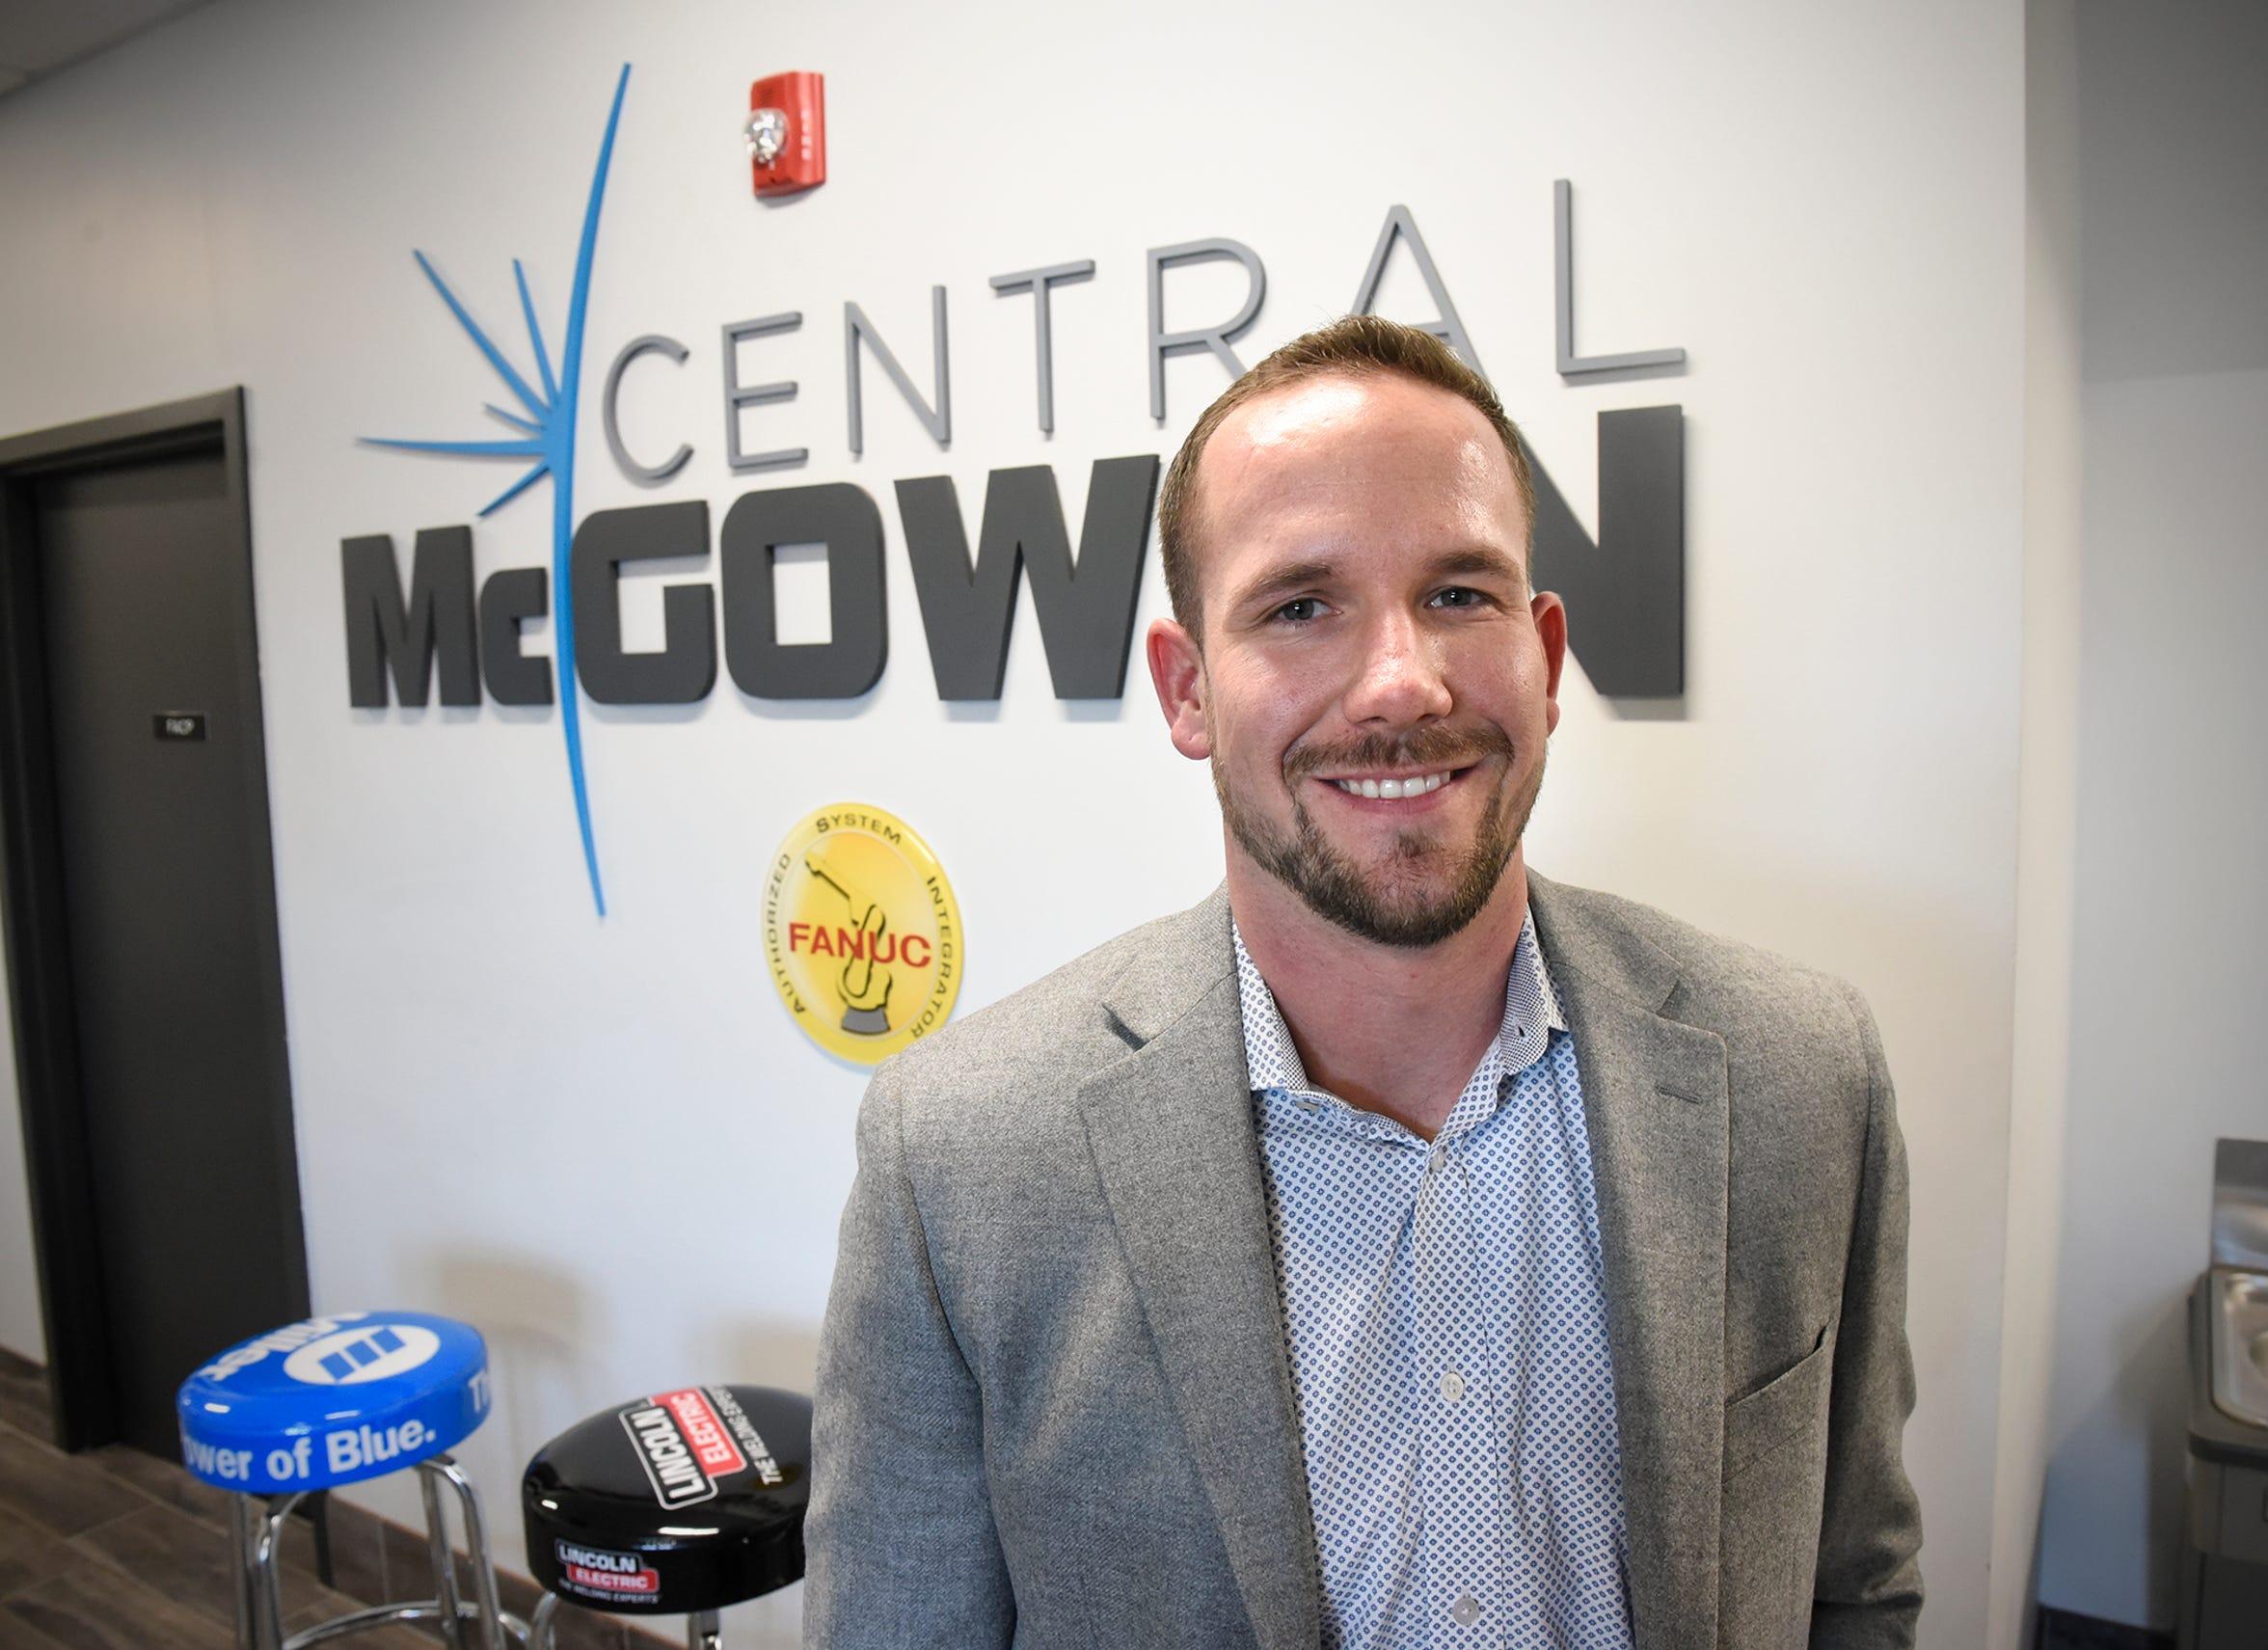 Central McGowan President and CEO Joe Francis smiles Thursday, Dec. 6, in St. Cloud.